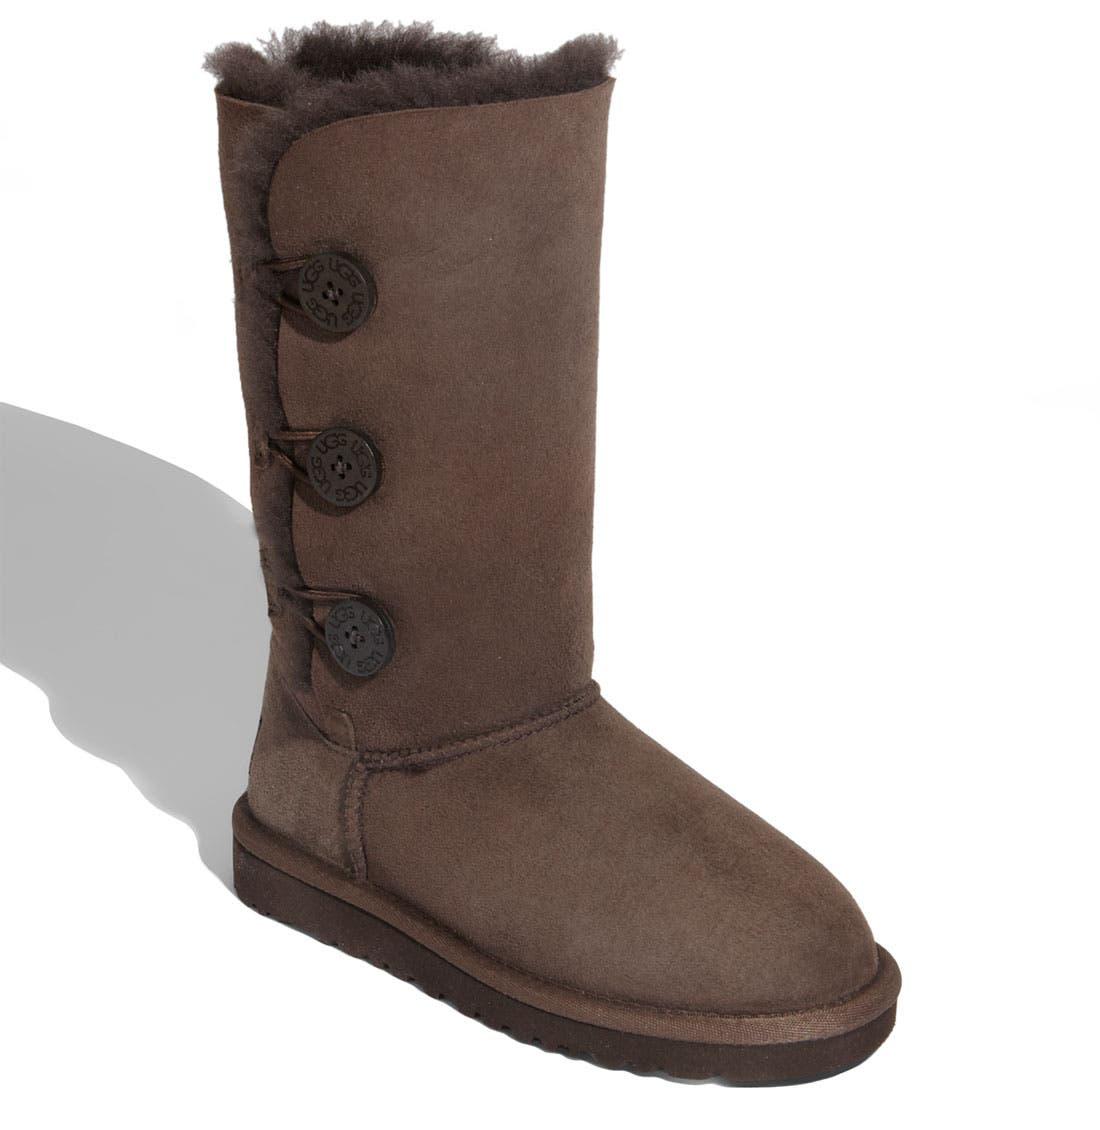 Main Image - UGG® 'Bailey Button Triplet' Boot (Little Kid & Big Kid)